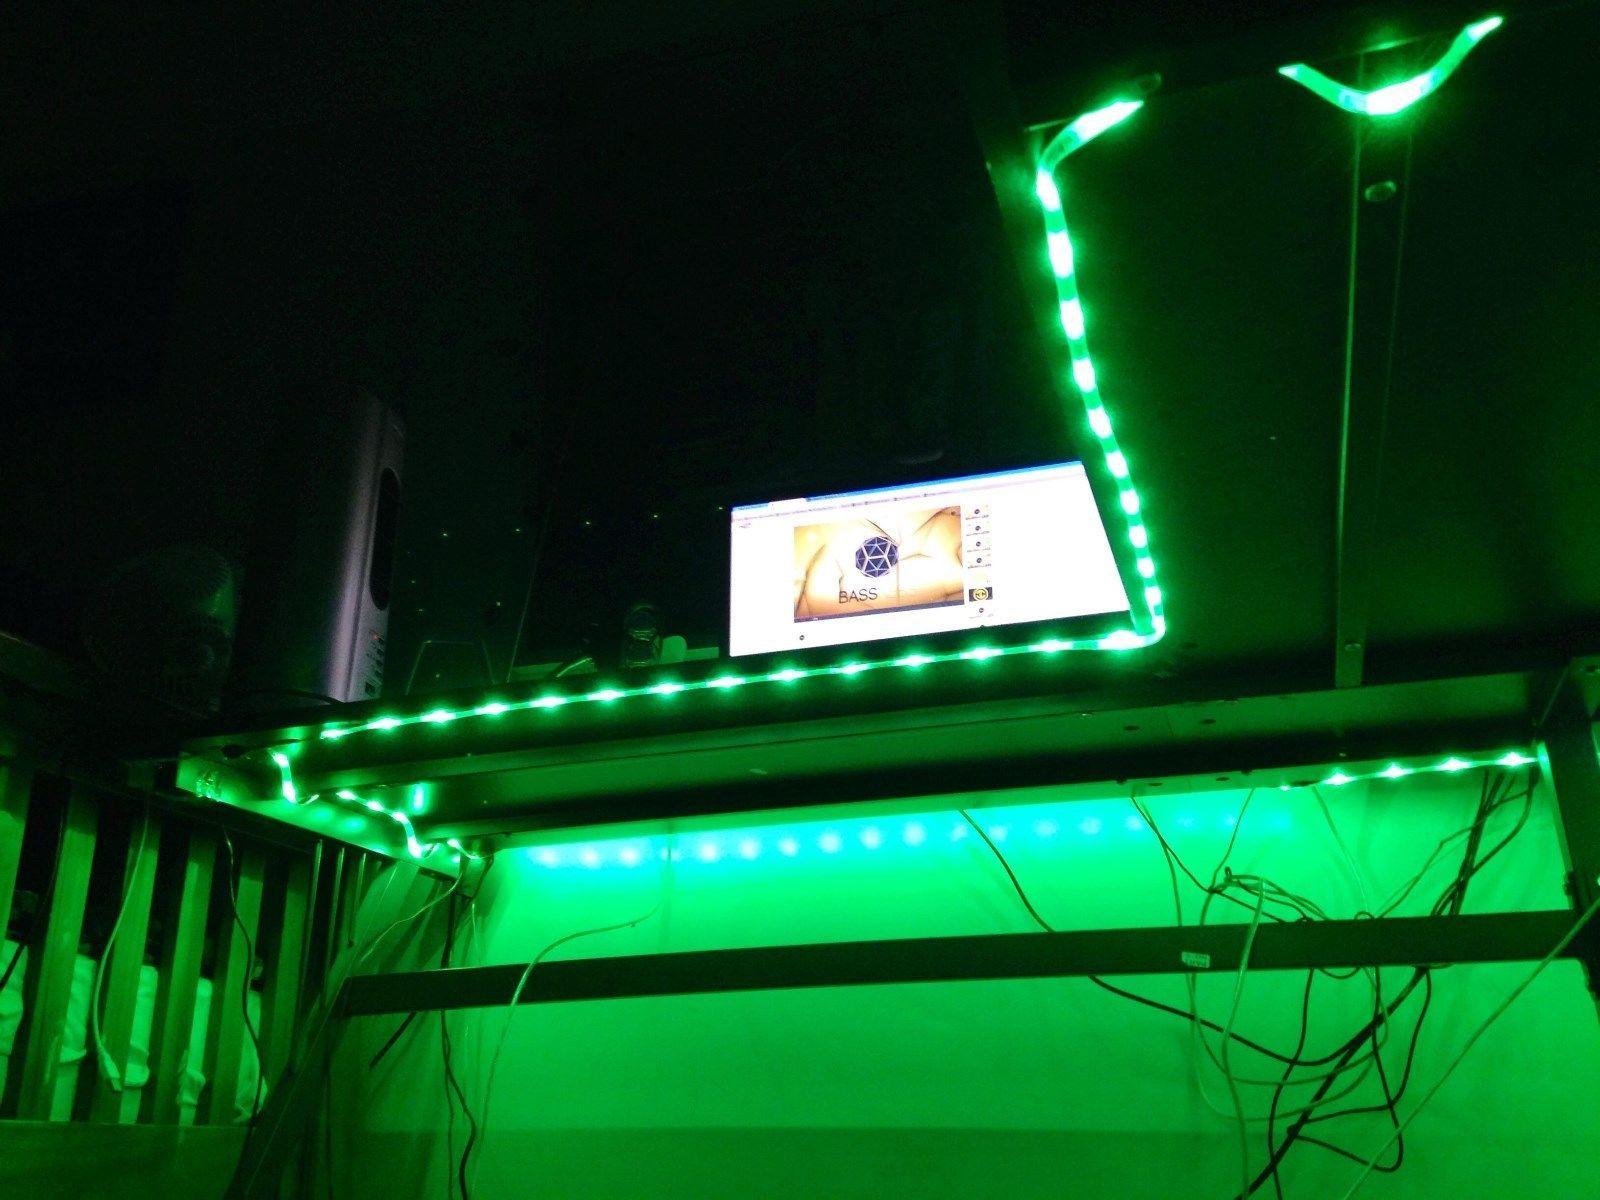 Game gaming desk led 150 lights color select 8ft for Select light